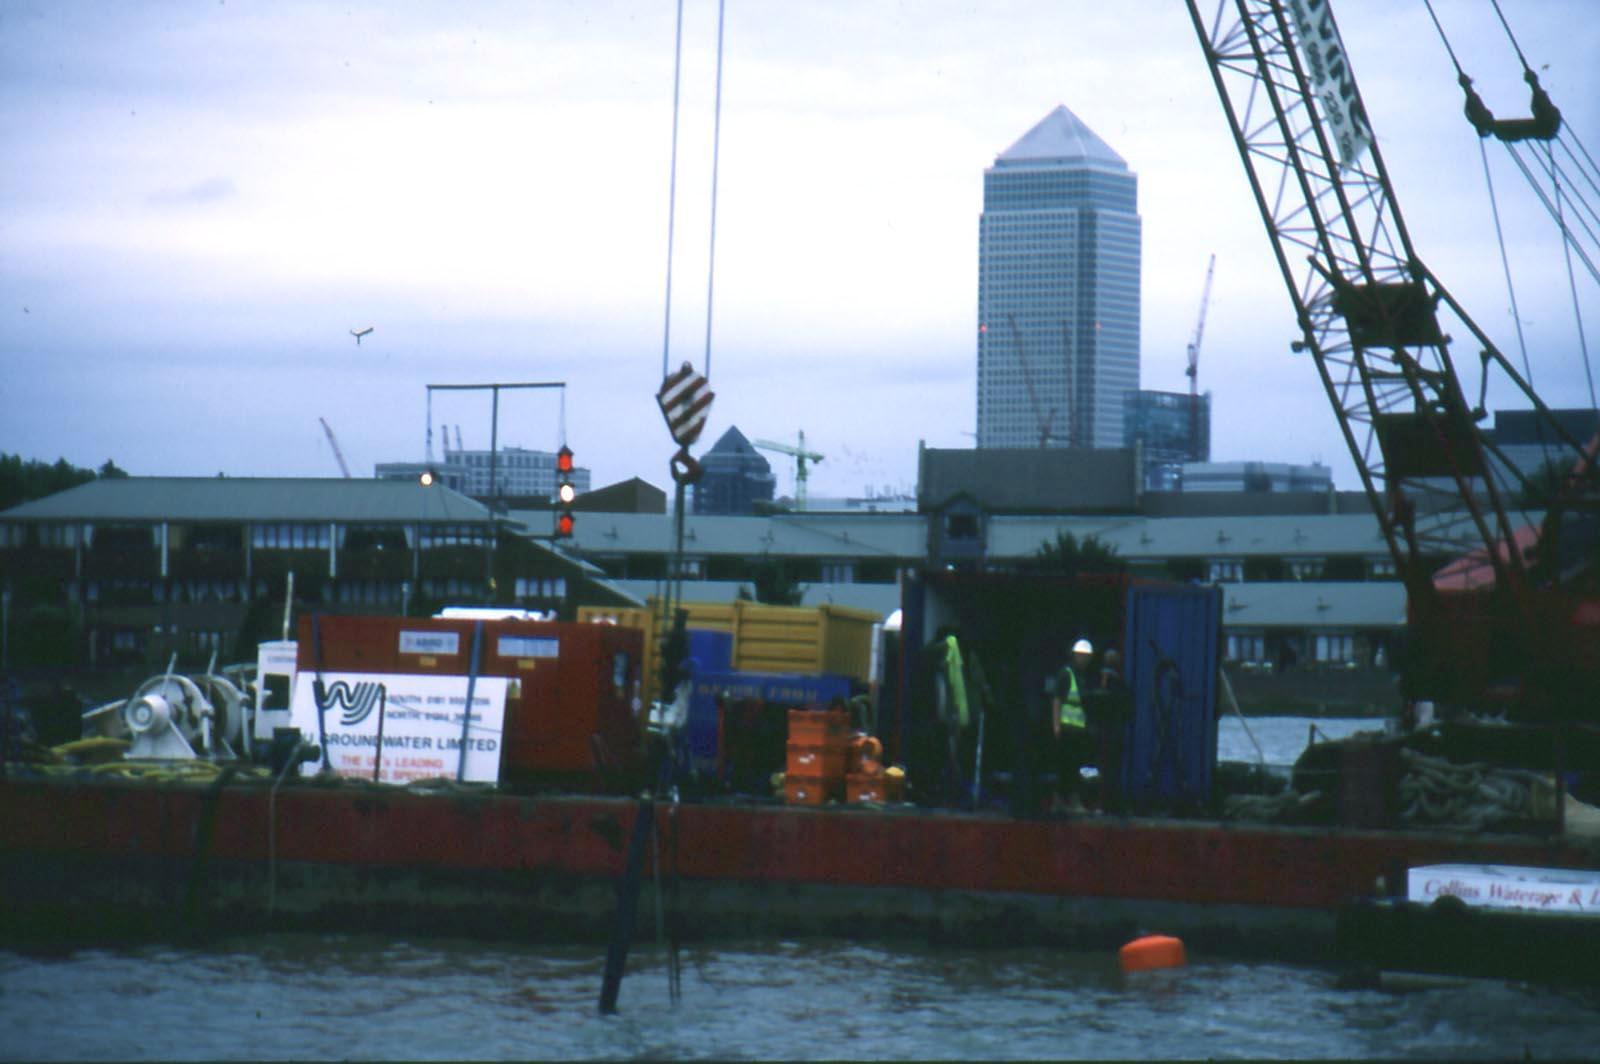 DLR-crane-barge.jpg